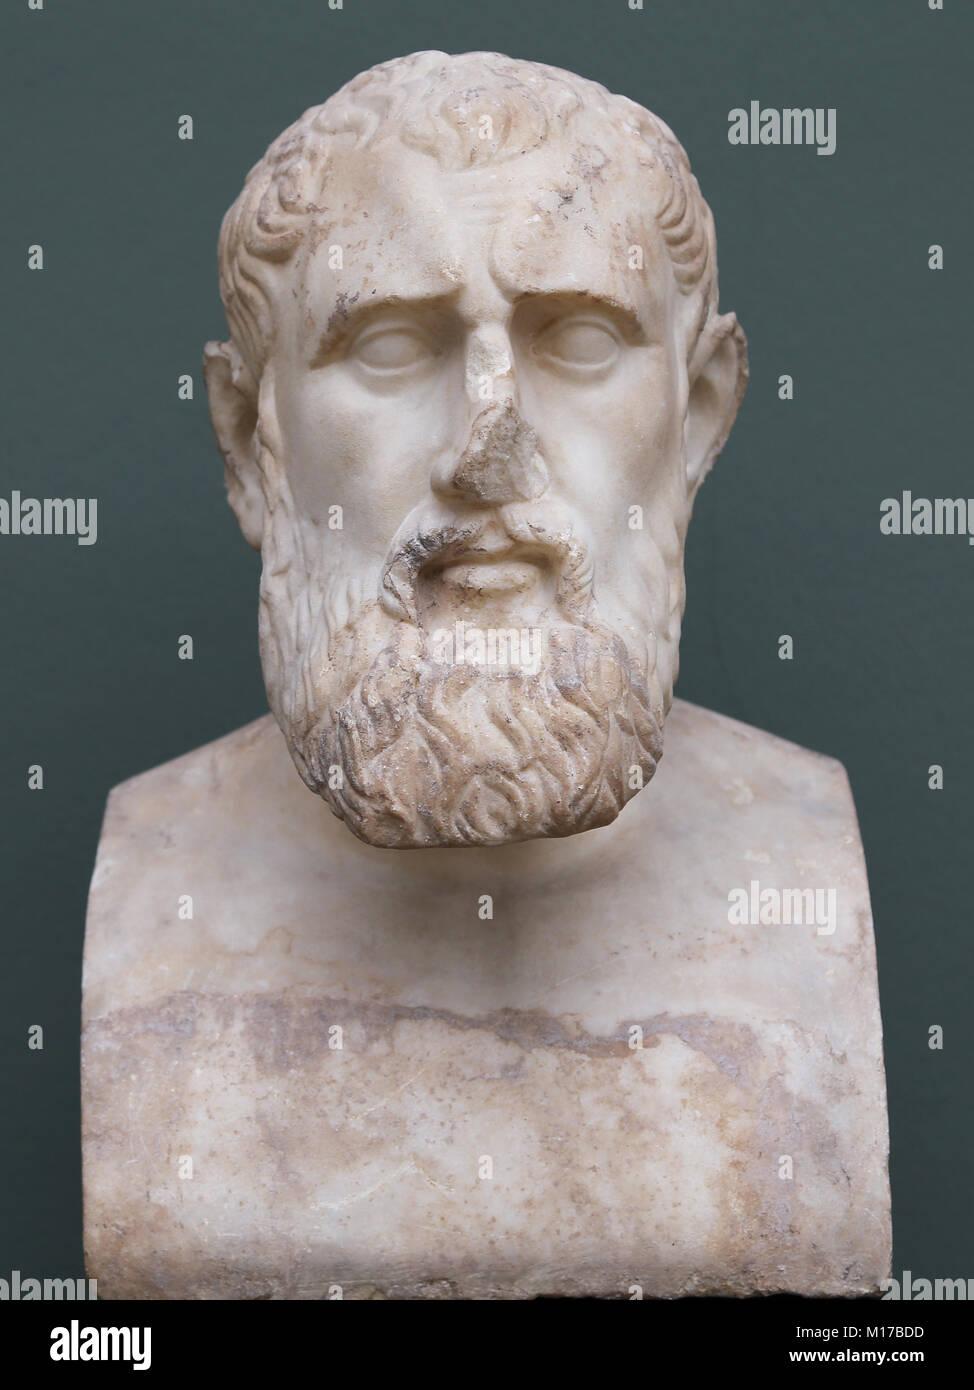 The Stoic Philosopher Zeno of Citium  (334-262 BC.) Marble. Roman copy of a greek original. NY Carlsberg Glyptotek. - Stock Image